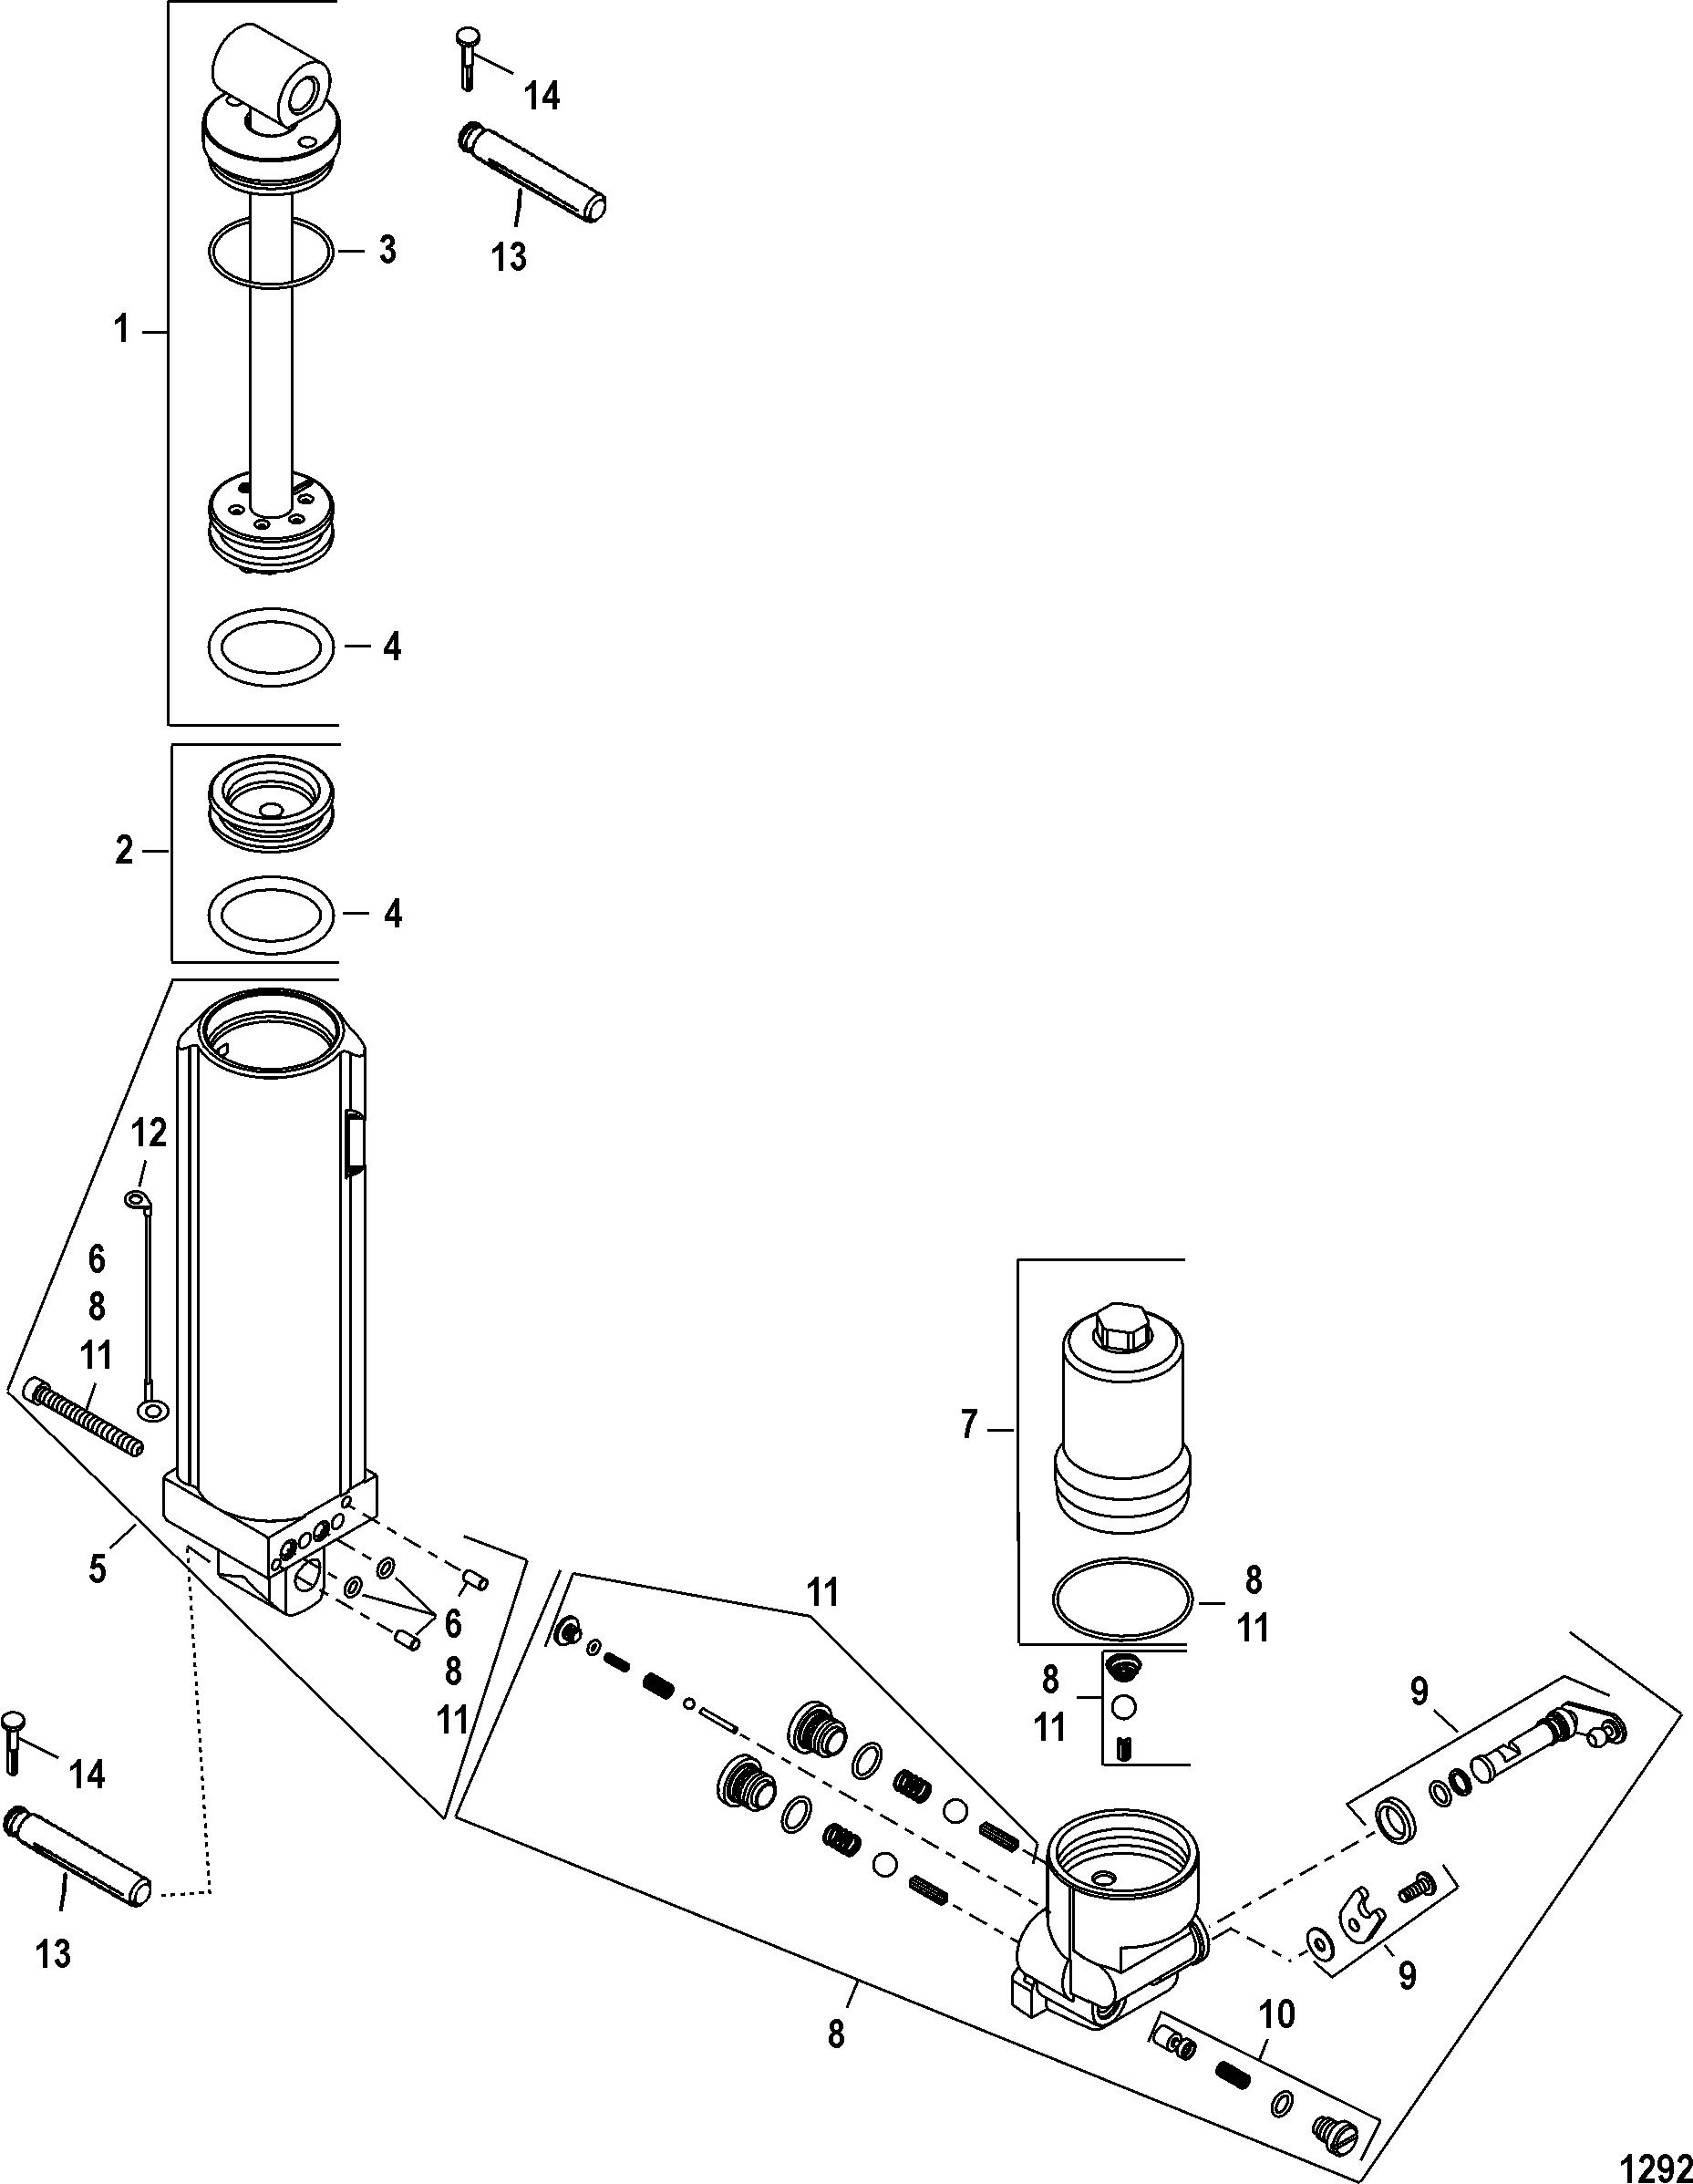 Manual Tilt FOR MARINER / MERCURY 30/40 EFI (3 CYL) 4-STROKE